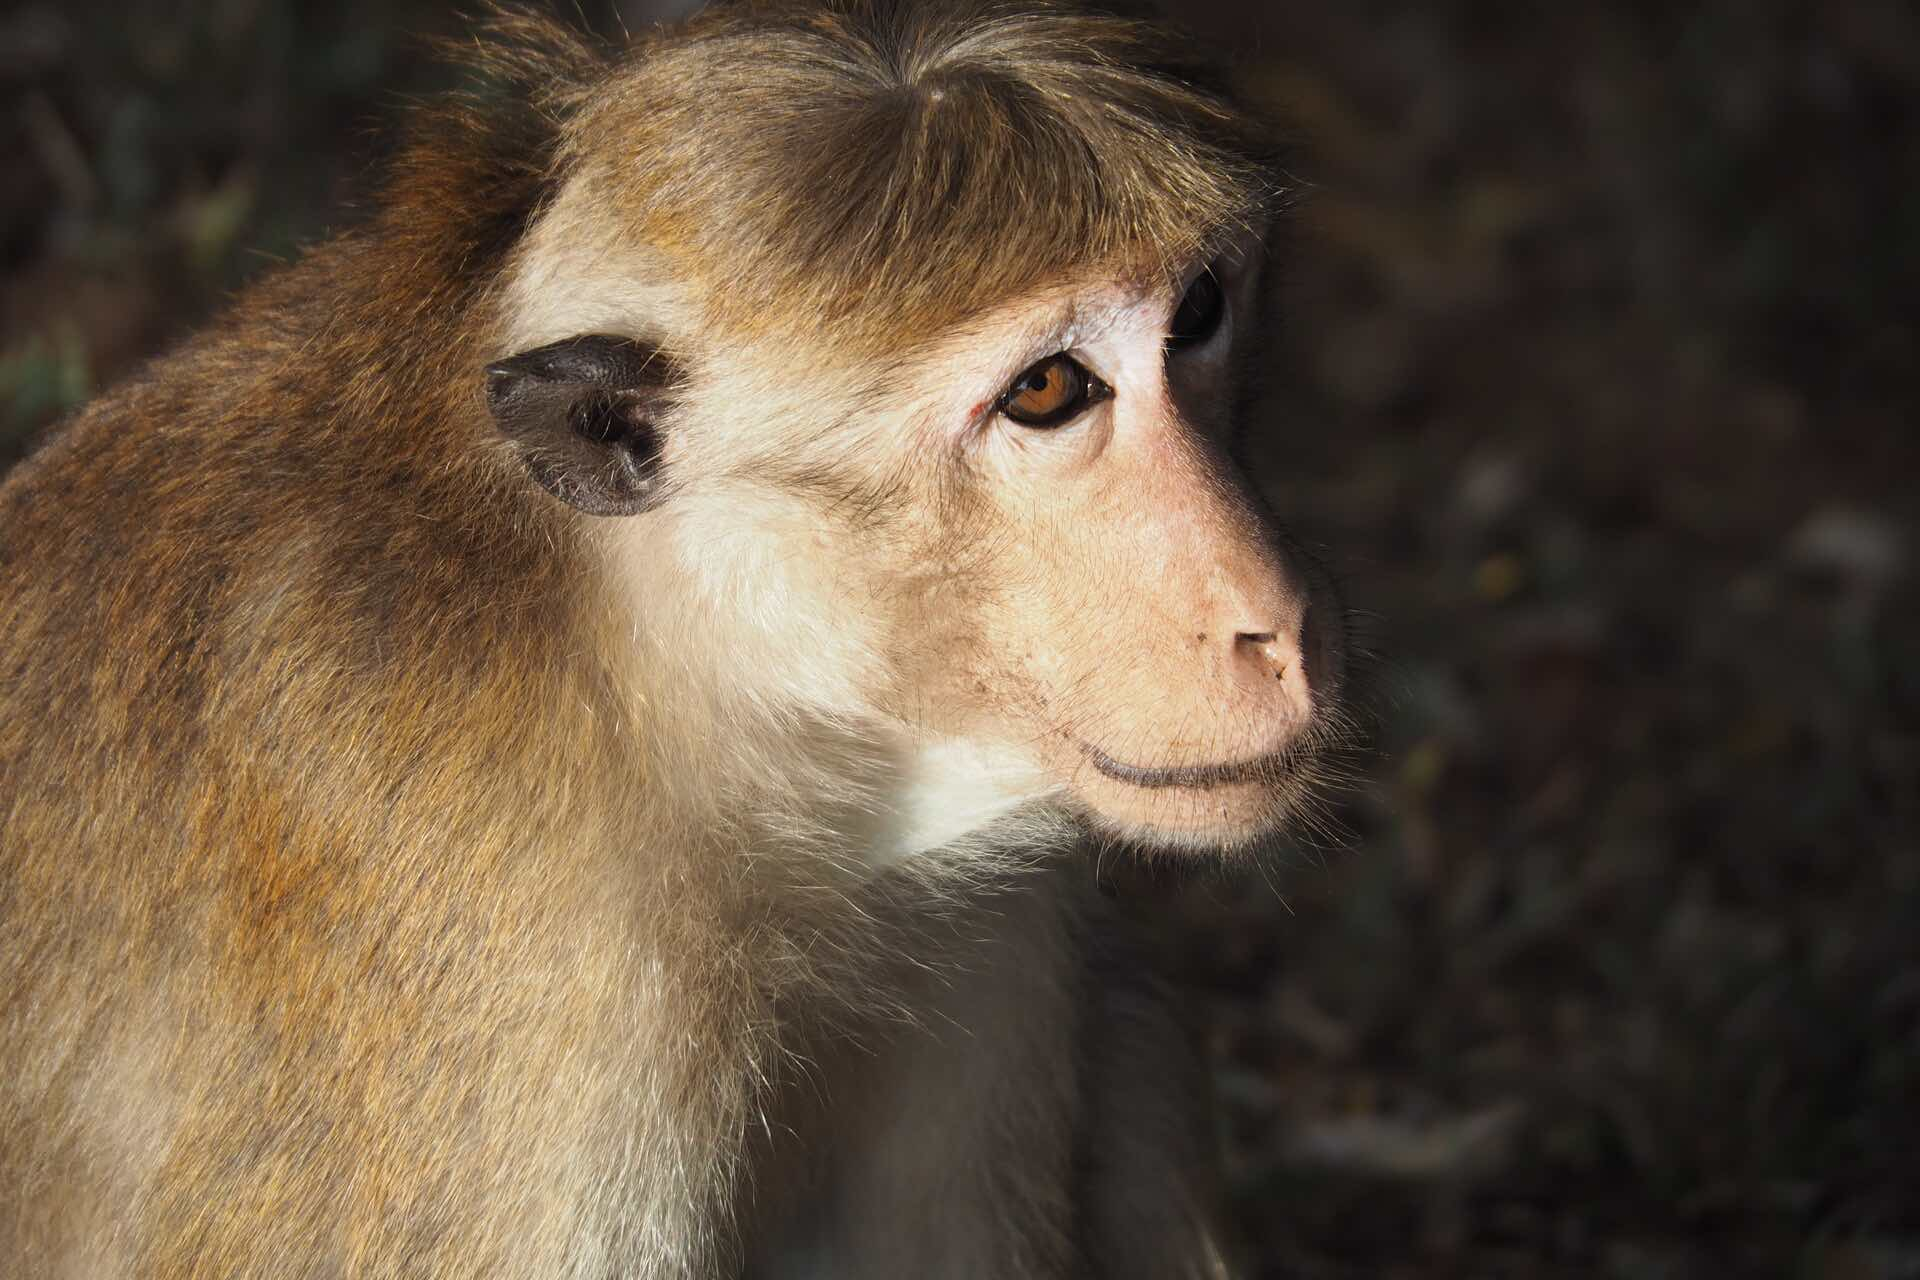 sri-lanka-monkey-holiday-review-feedback-invite-to-paradise-quentin-kate-hulm.jpg